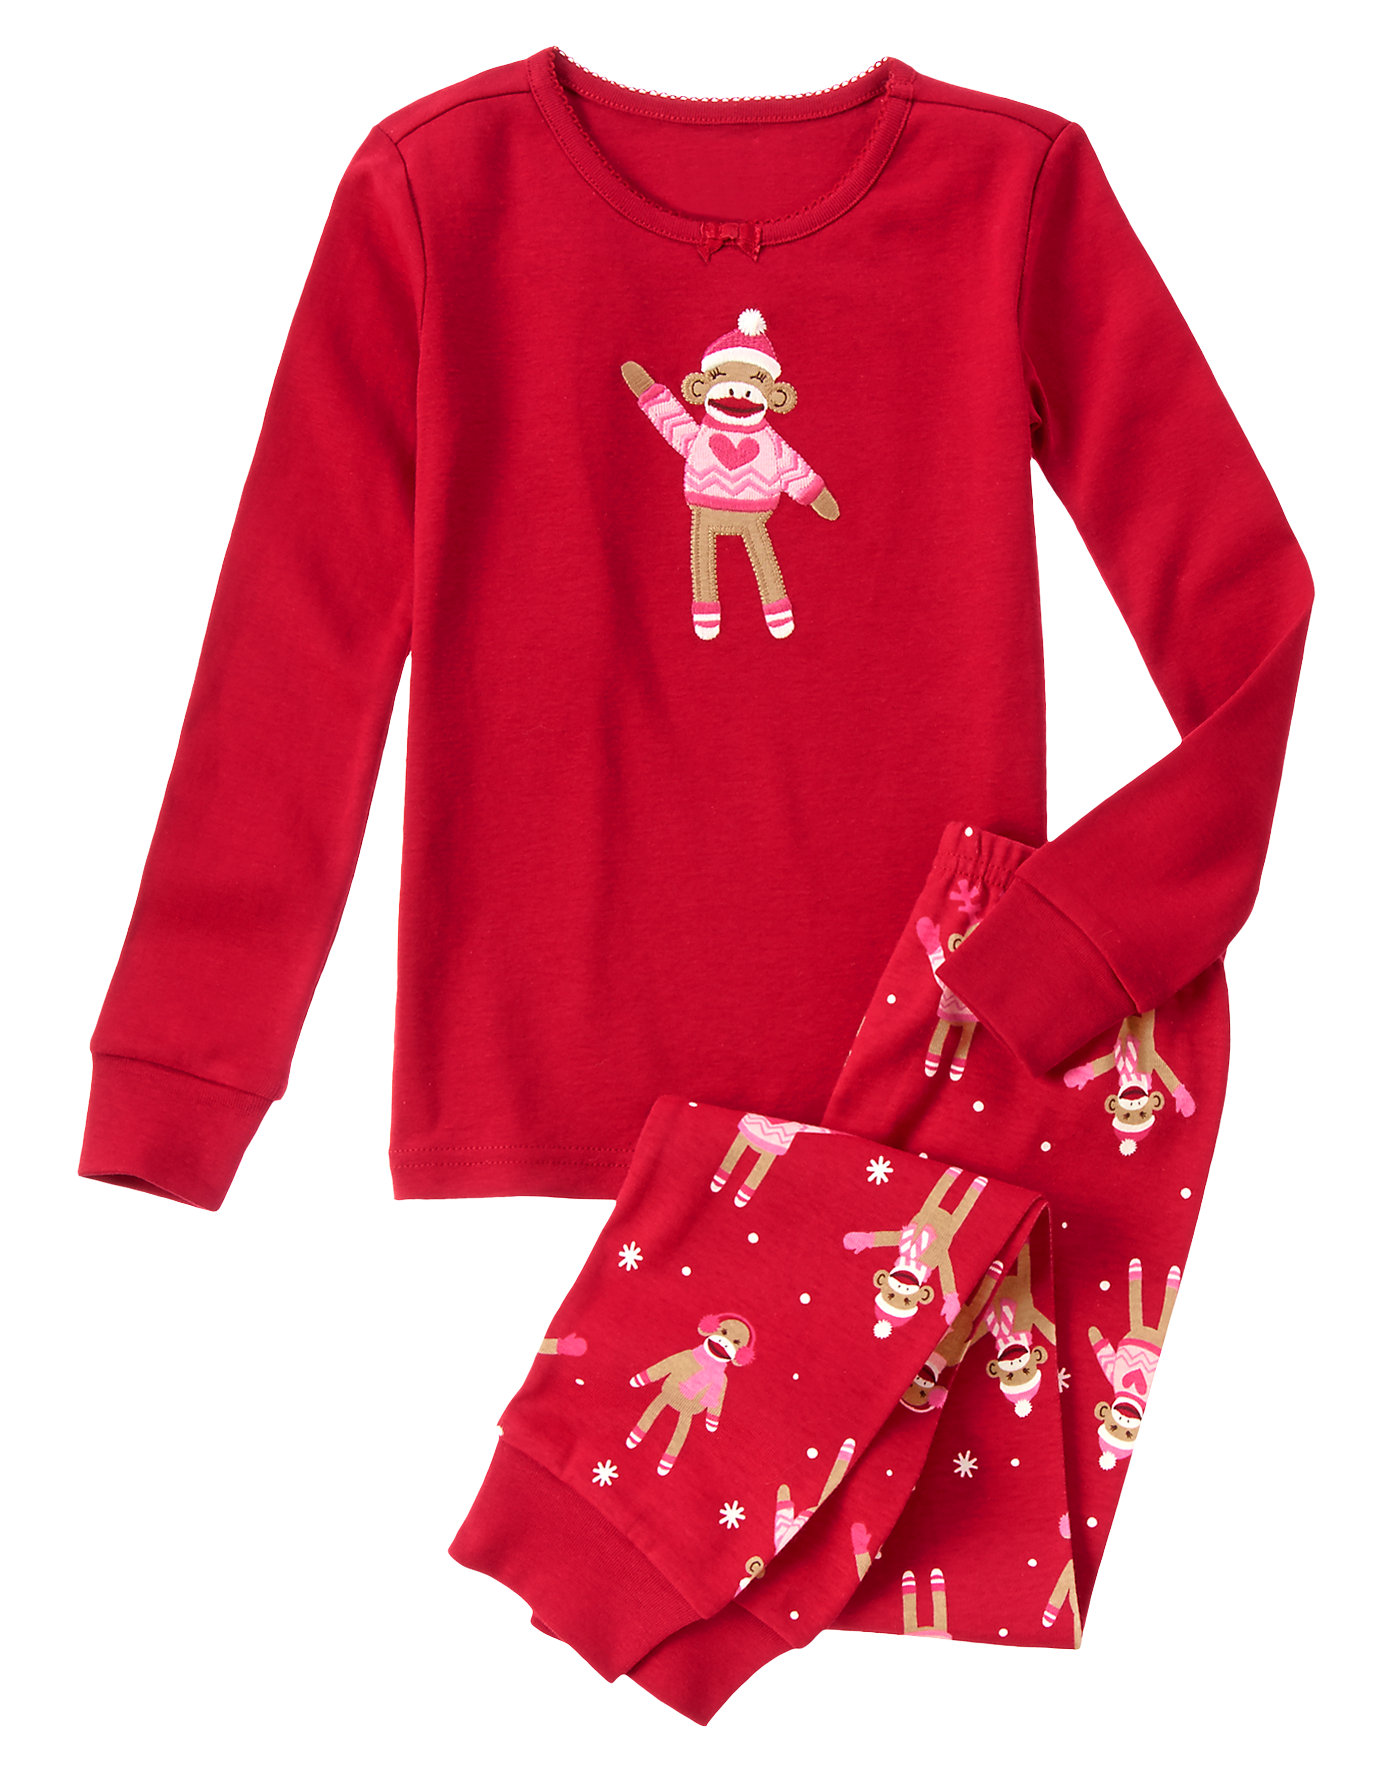 festive family sleepwear divine lifestyle